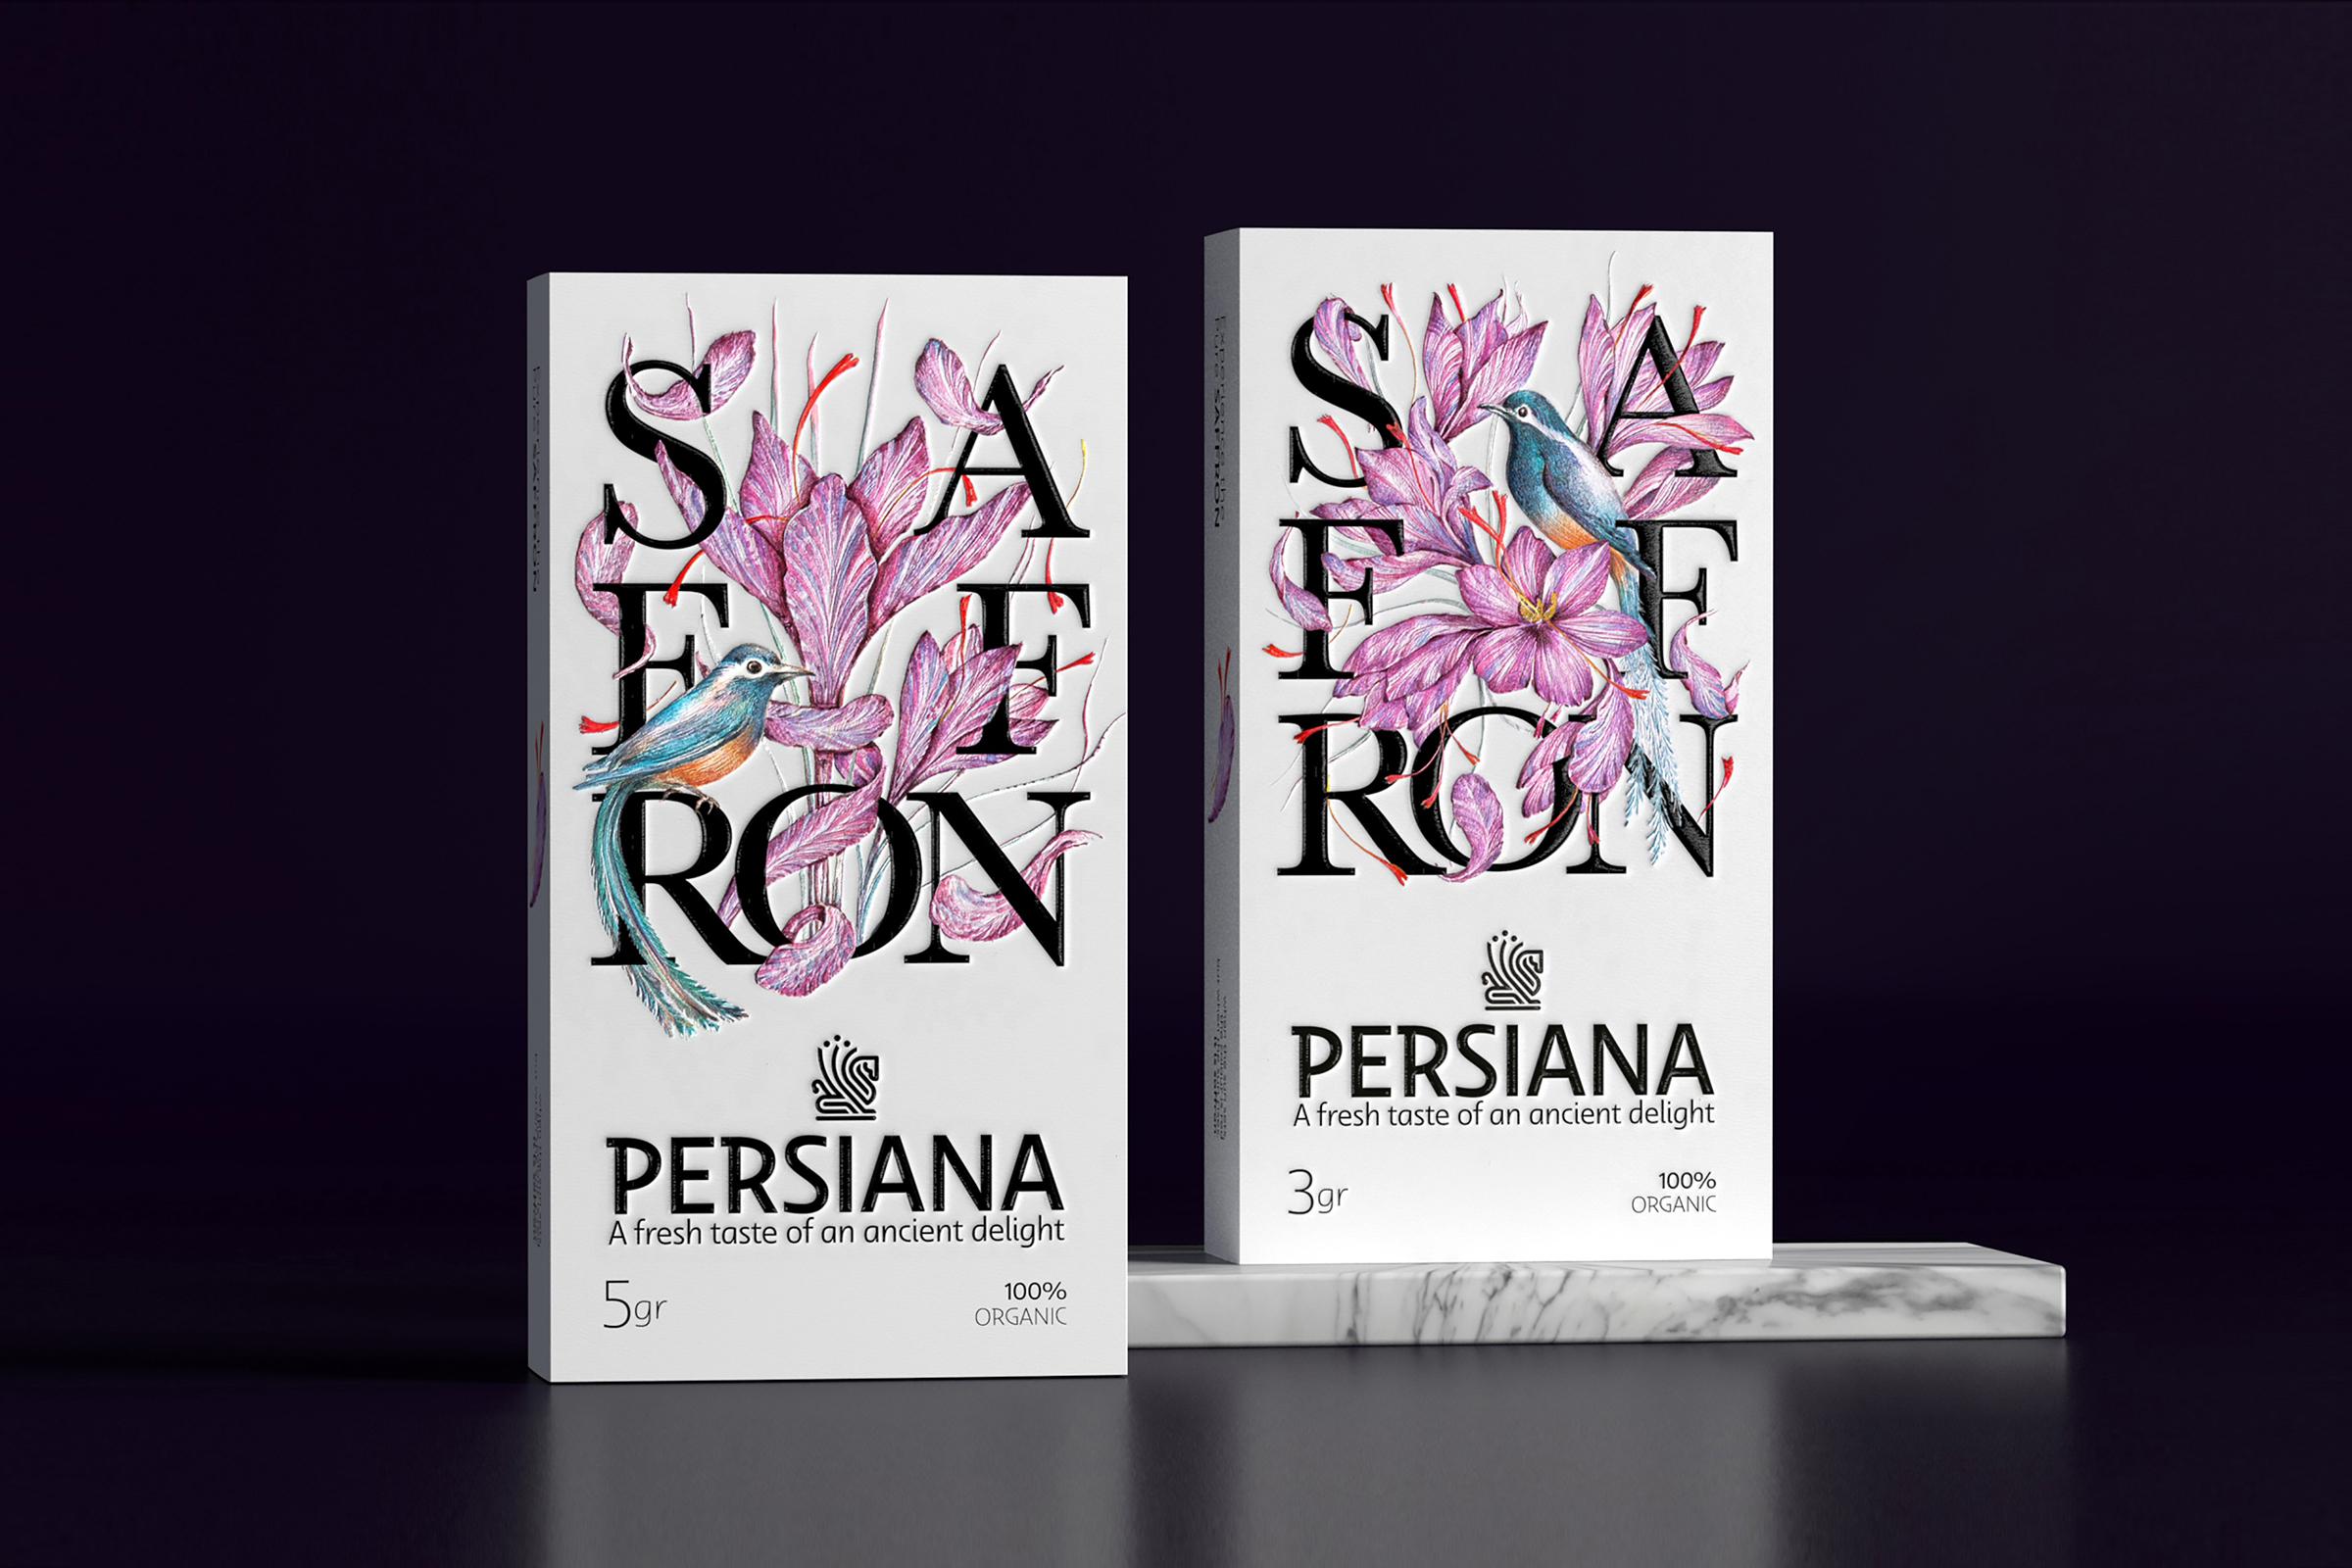 Packaging Design for Persiana Saffron Brand